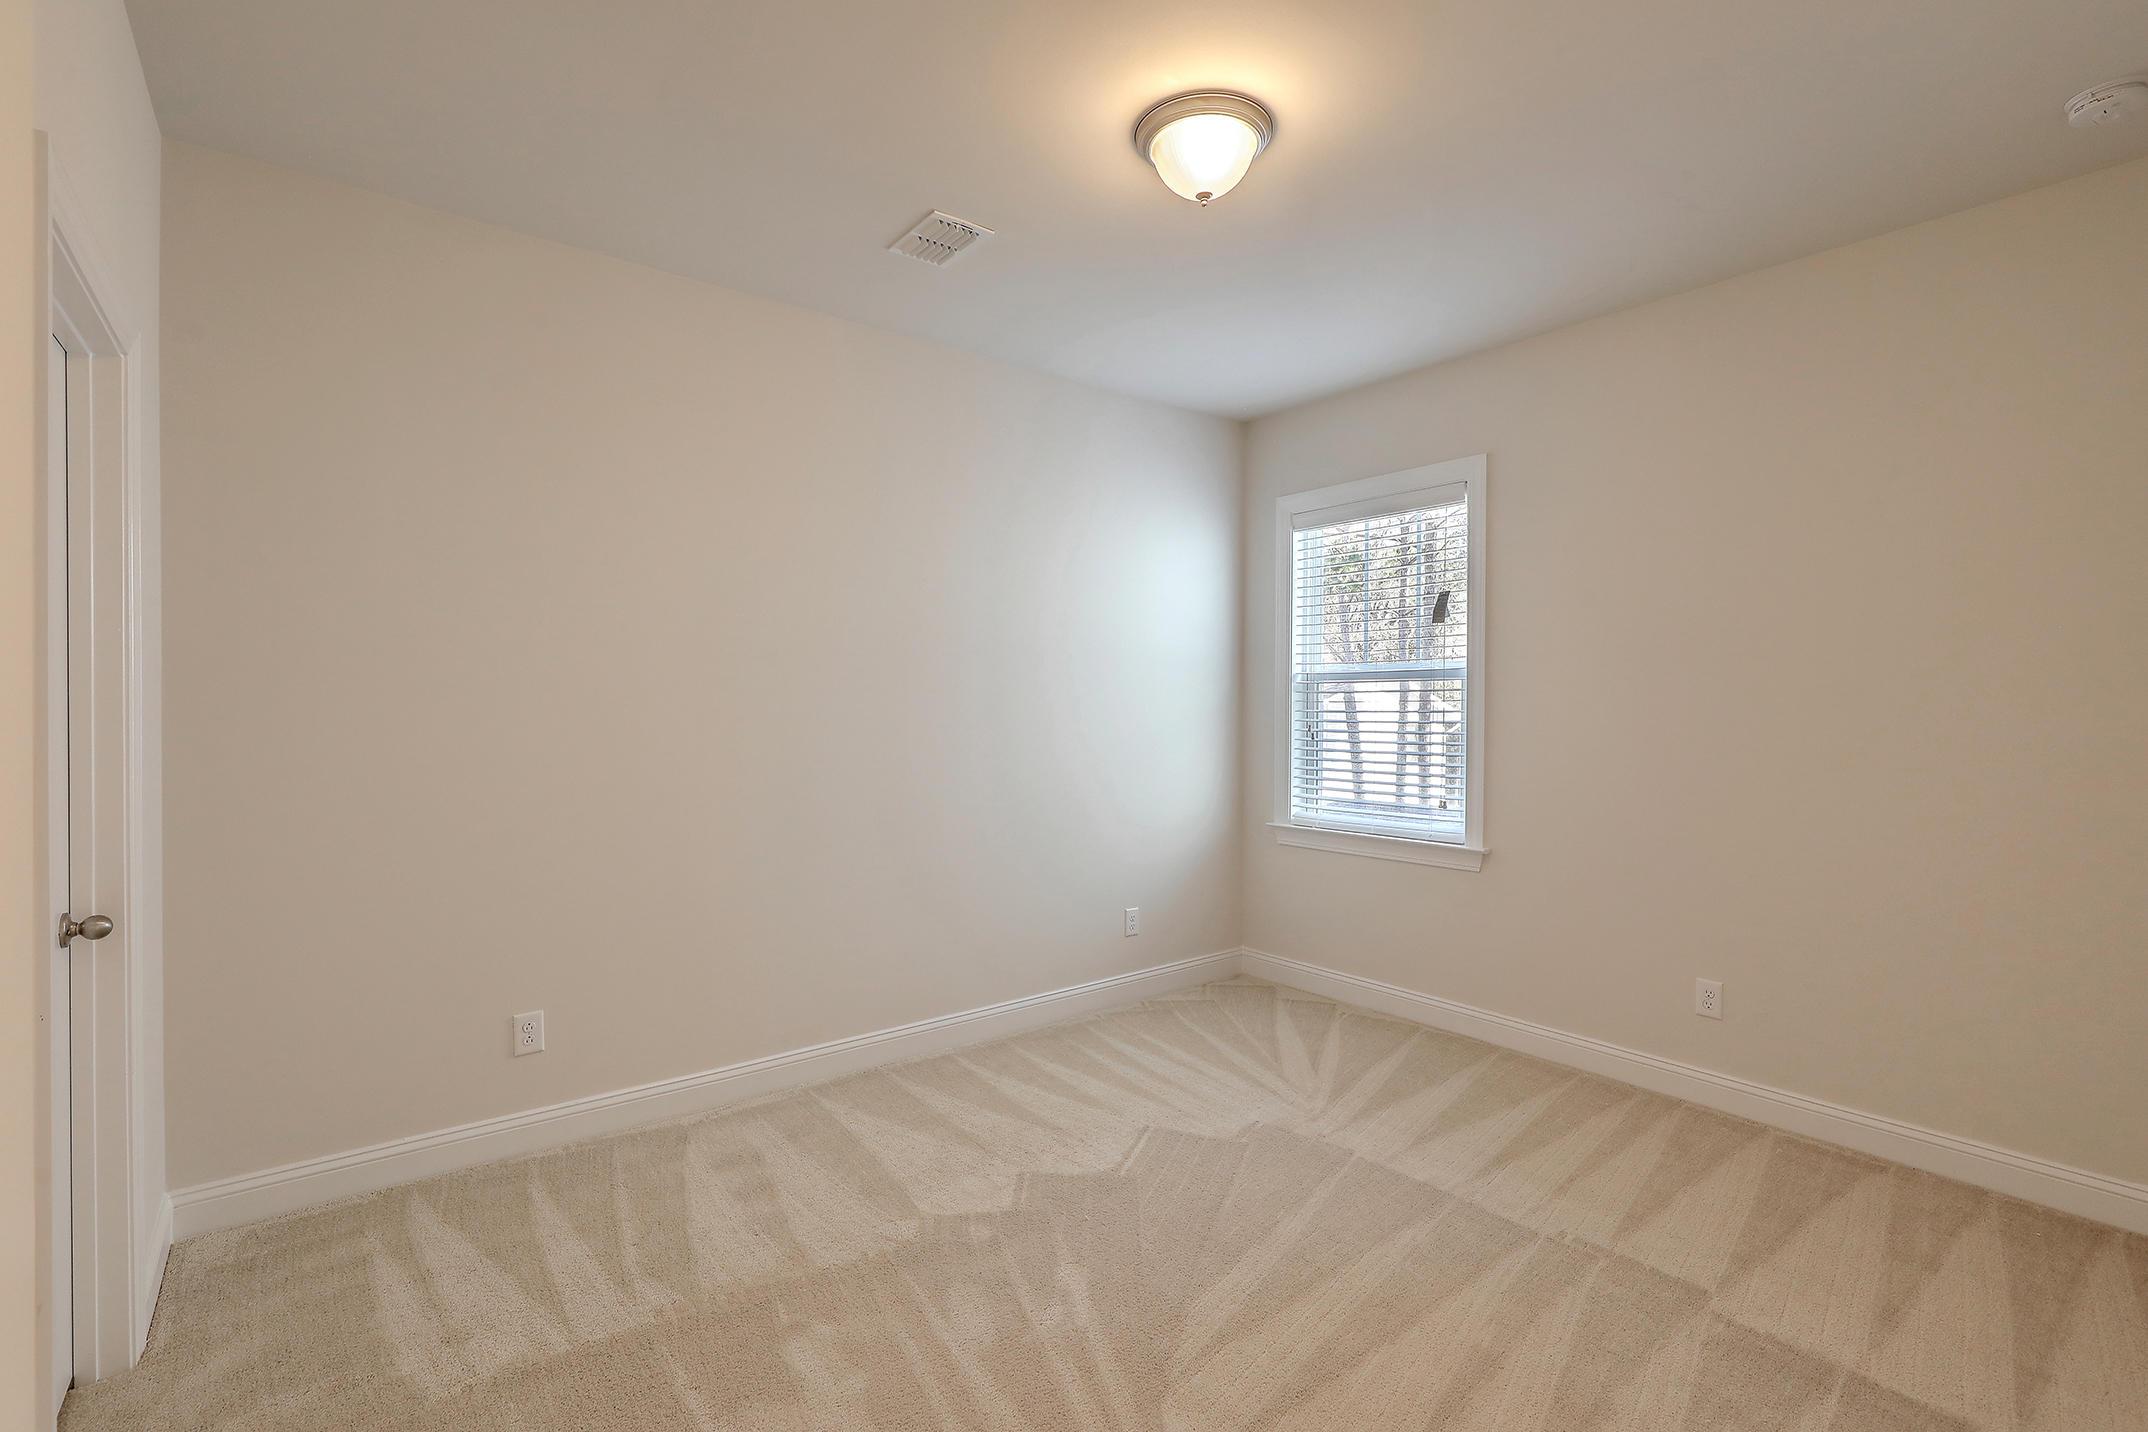 Bentley Park Homes For Sale - 1281 Gannett, Mount Pleasant, SC - 27